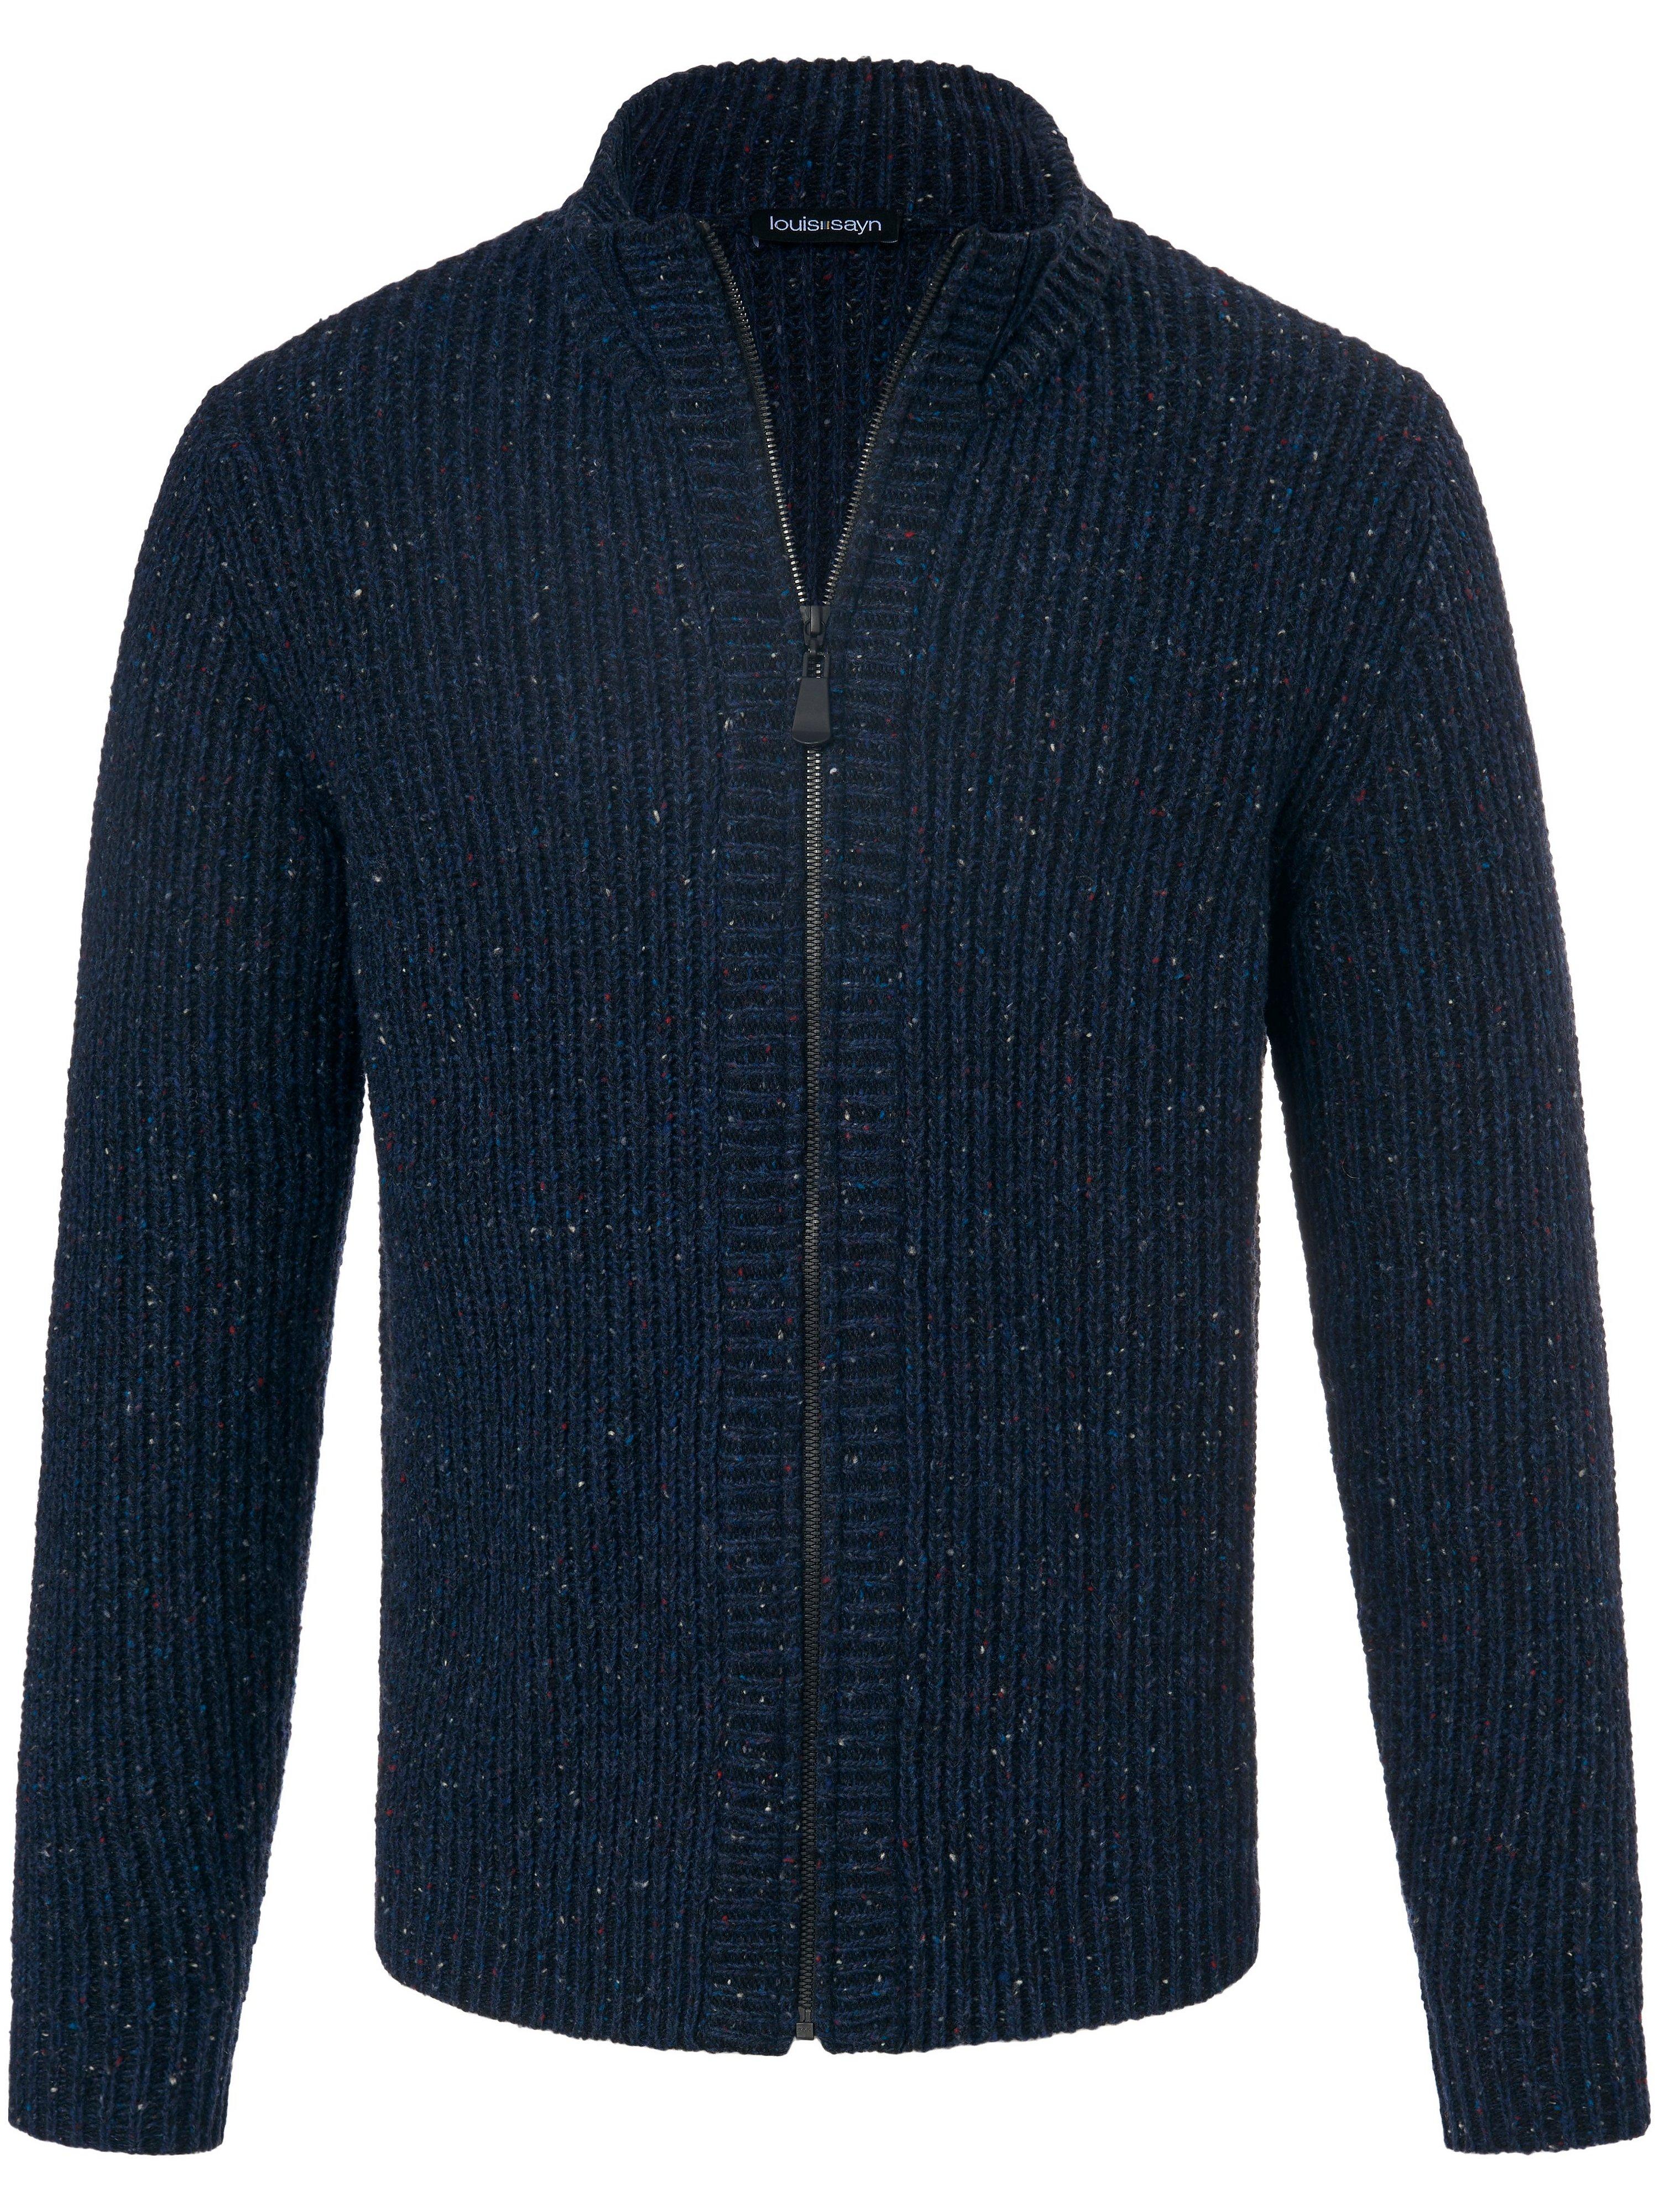 Vest in grofbreisel schipperskraag Van Louis Sayn blauw